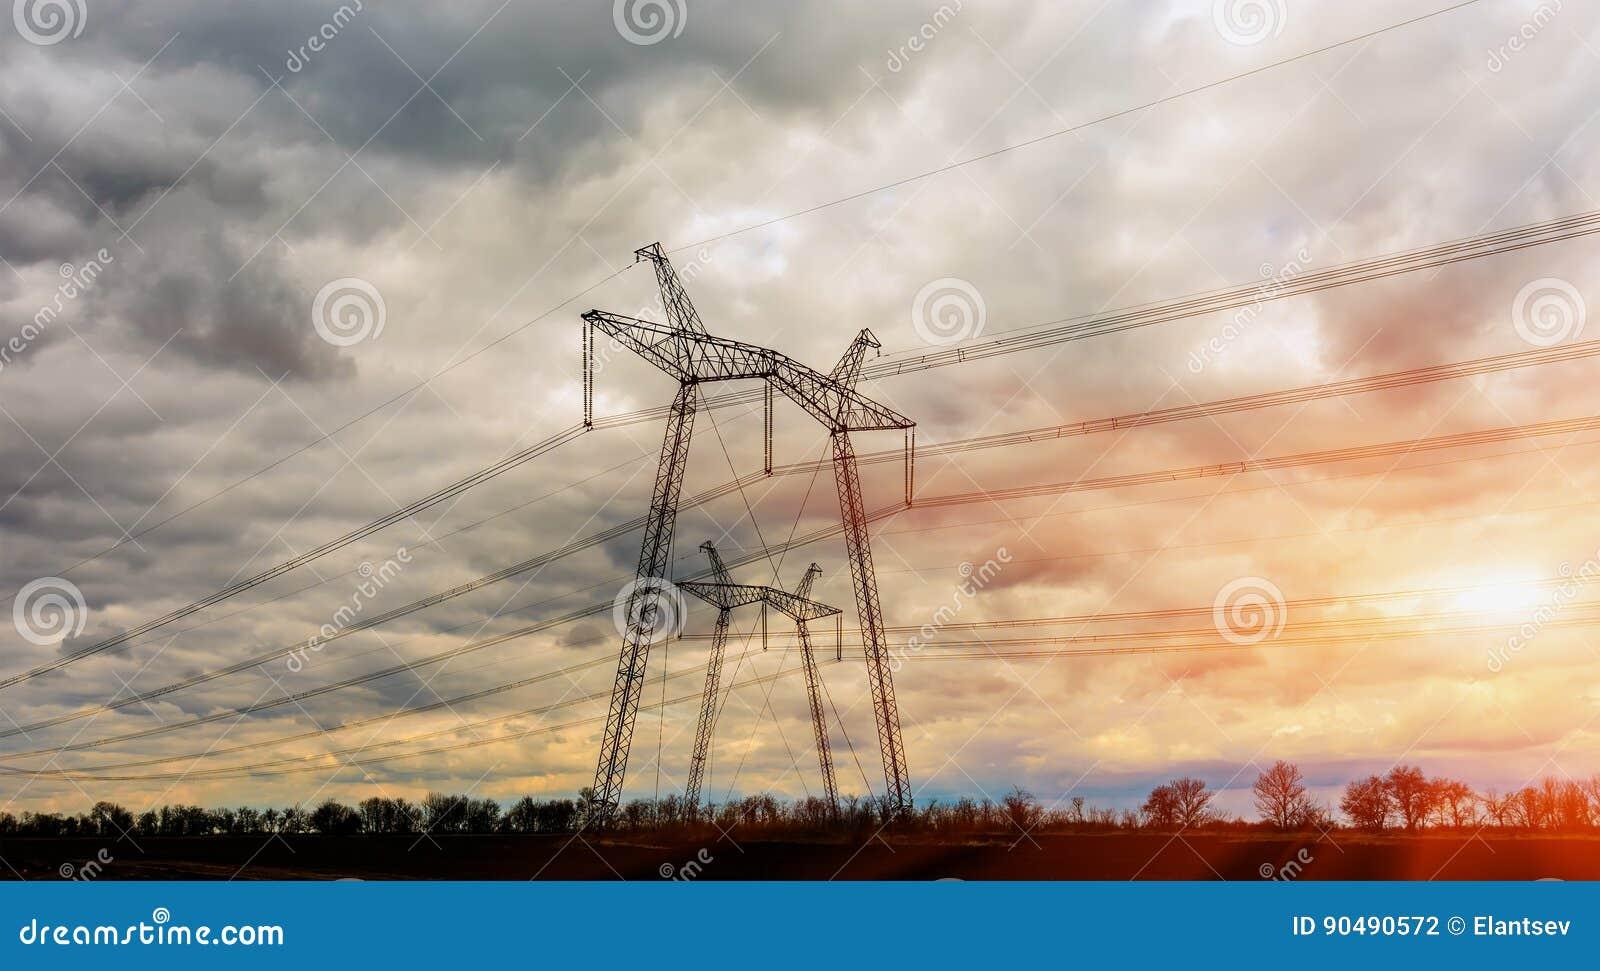 Electricity Pylon - overhead power line transmission tower.